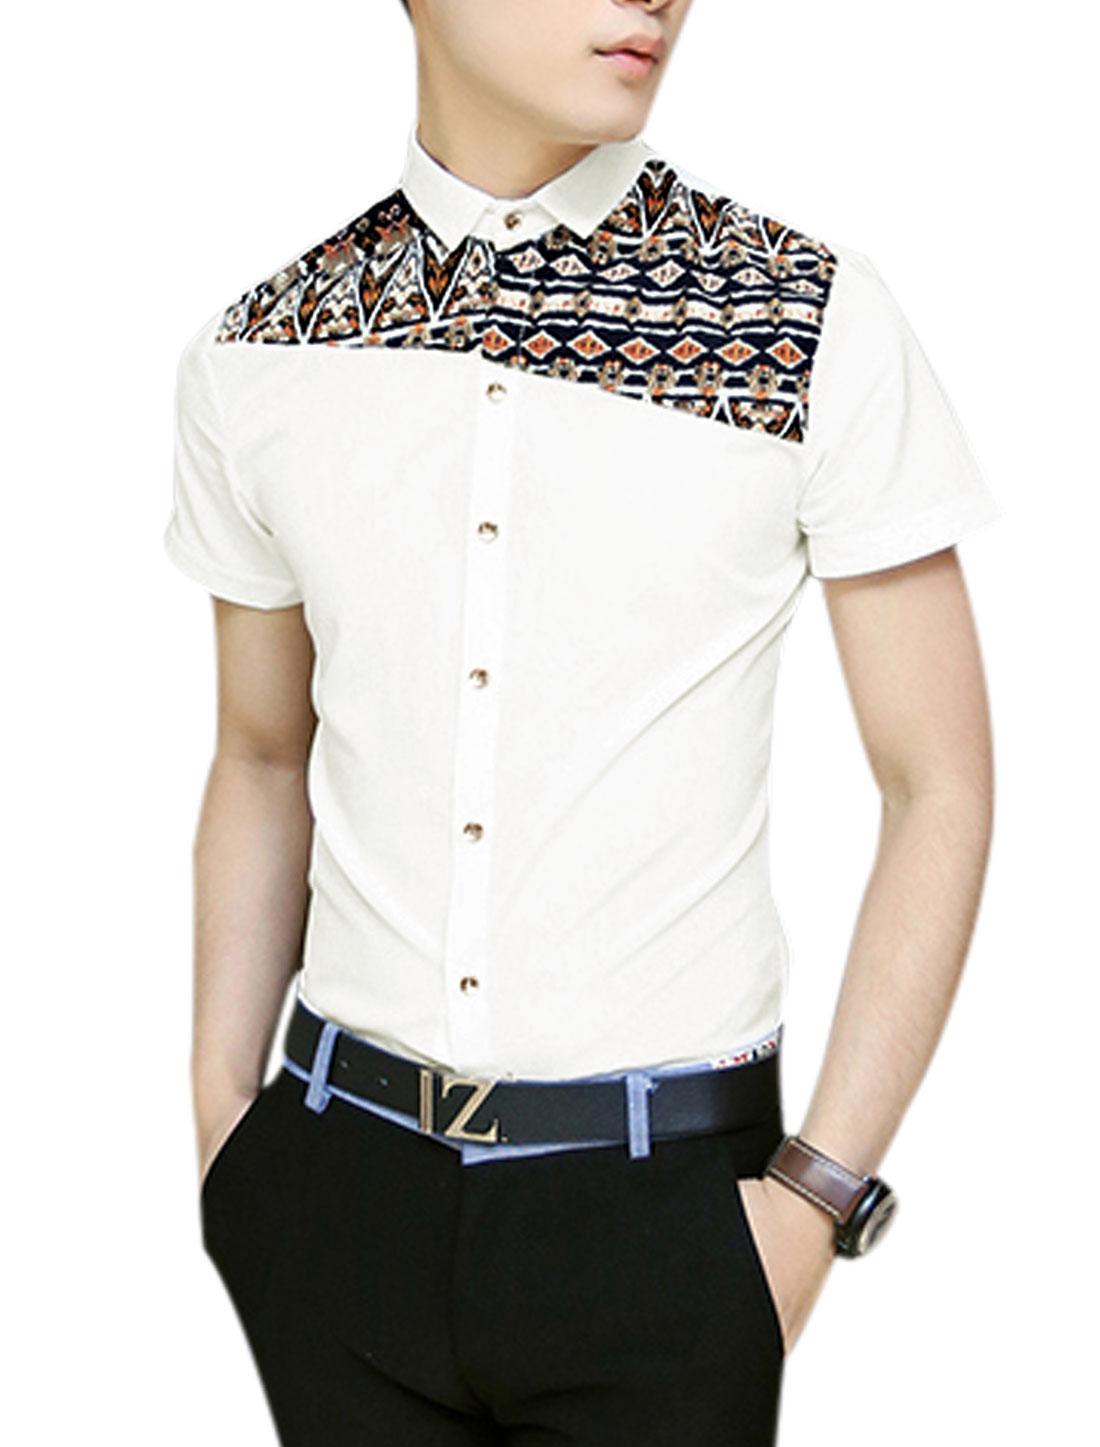 Men Button Closure Novelty Prints Panel Design Shirt White S